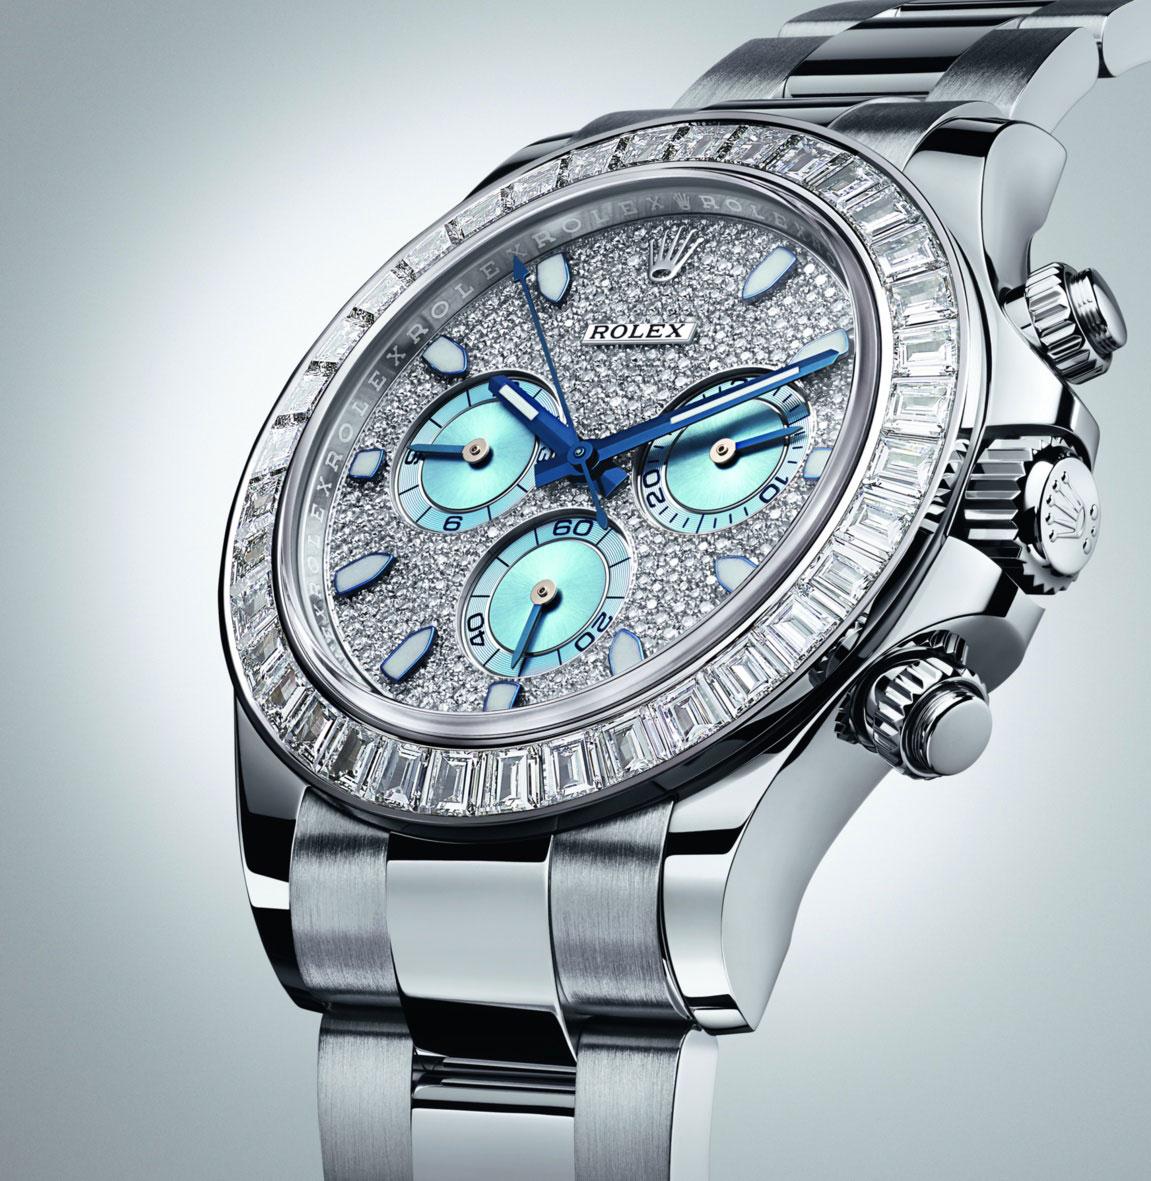 Rolex Cosmograph Daytona - Baselworld 2014